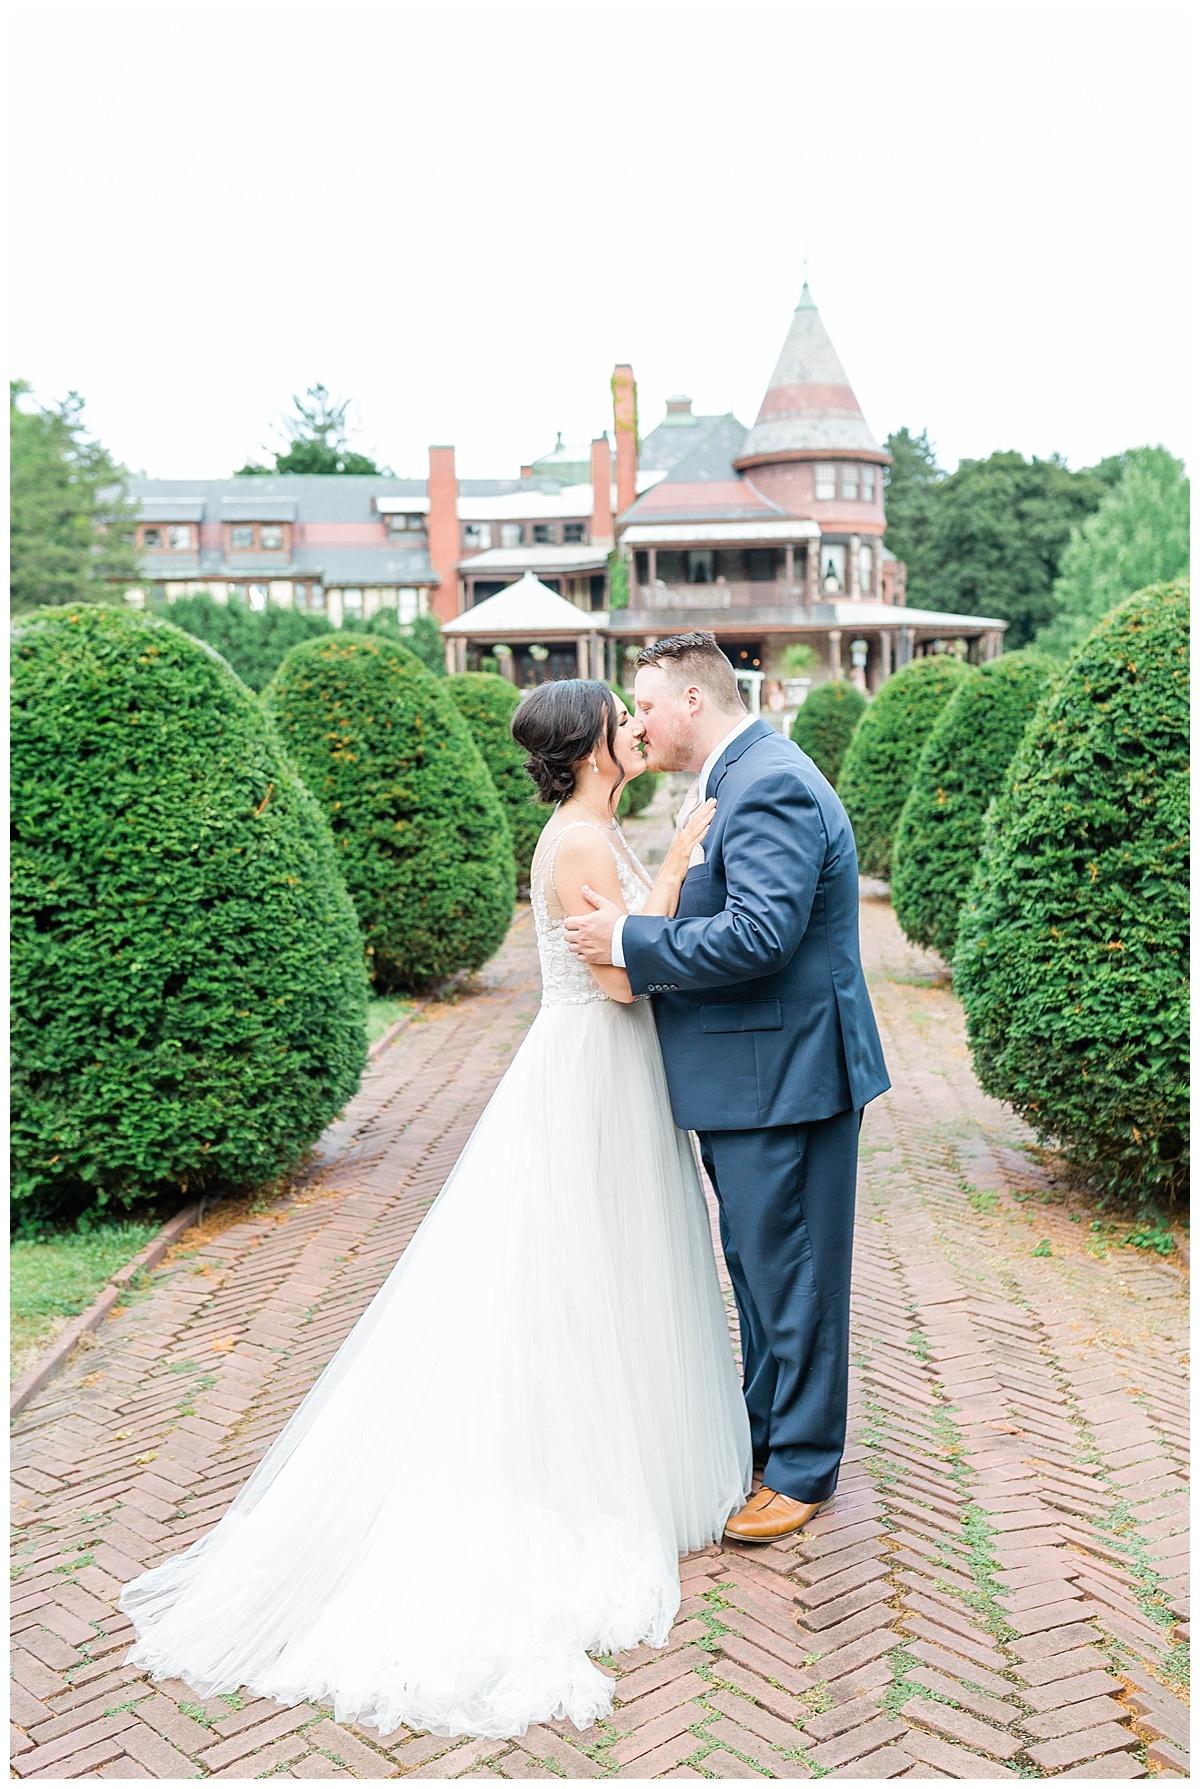 Rachel and Nick - Sonnenberg Gardens Wedding-441.jpg